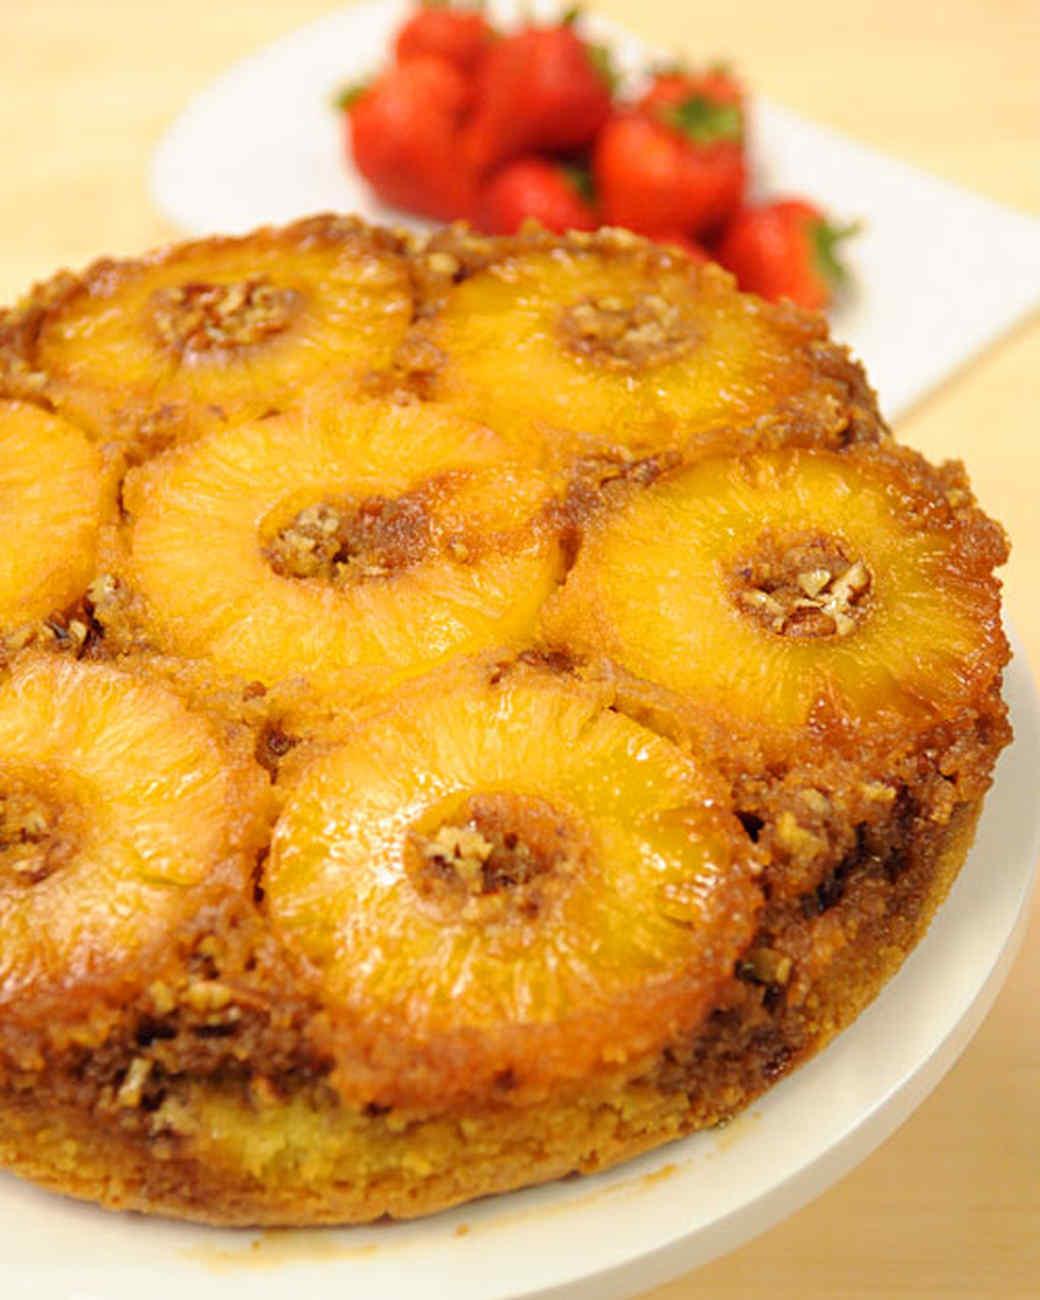 Grandma Bea's Pineapple Upside-Down Cake Recipe & Video